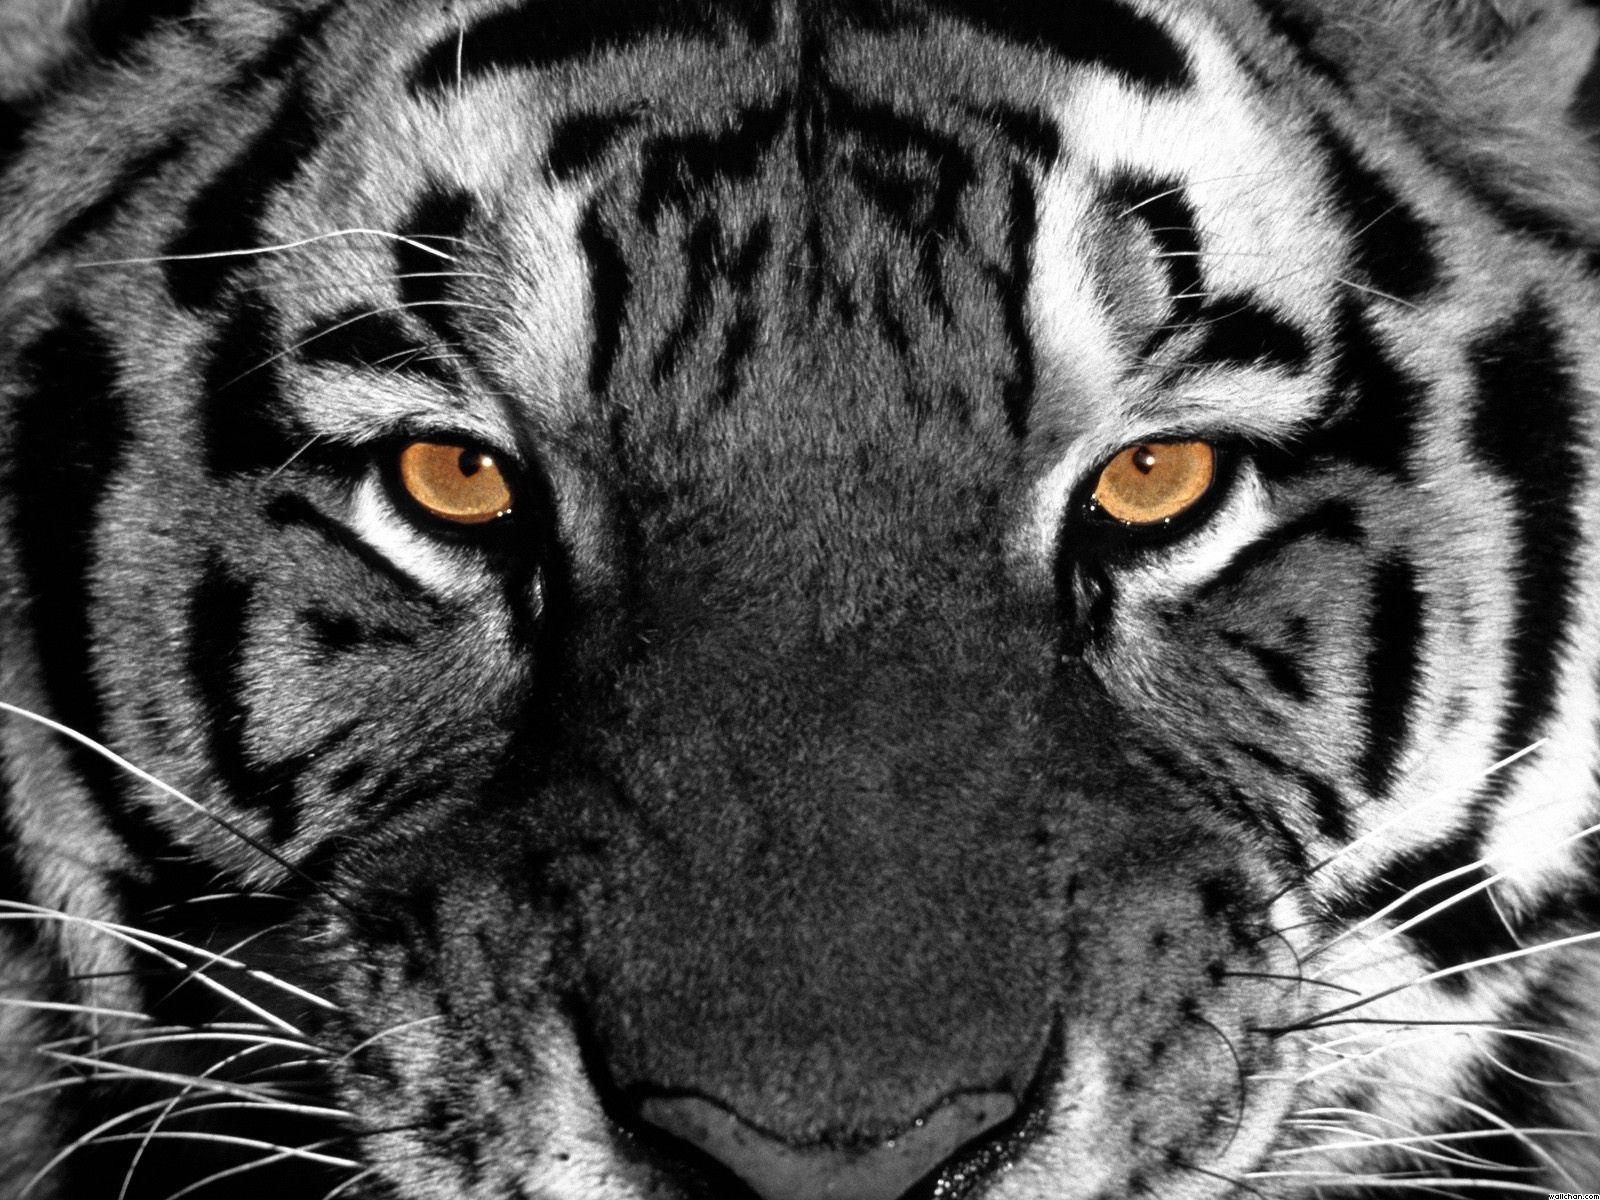 Tiger Eyes Wallpaper - Eyes Wallpaper (28331382) - Fanpop